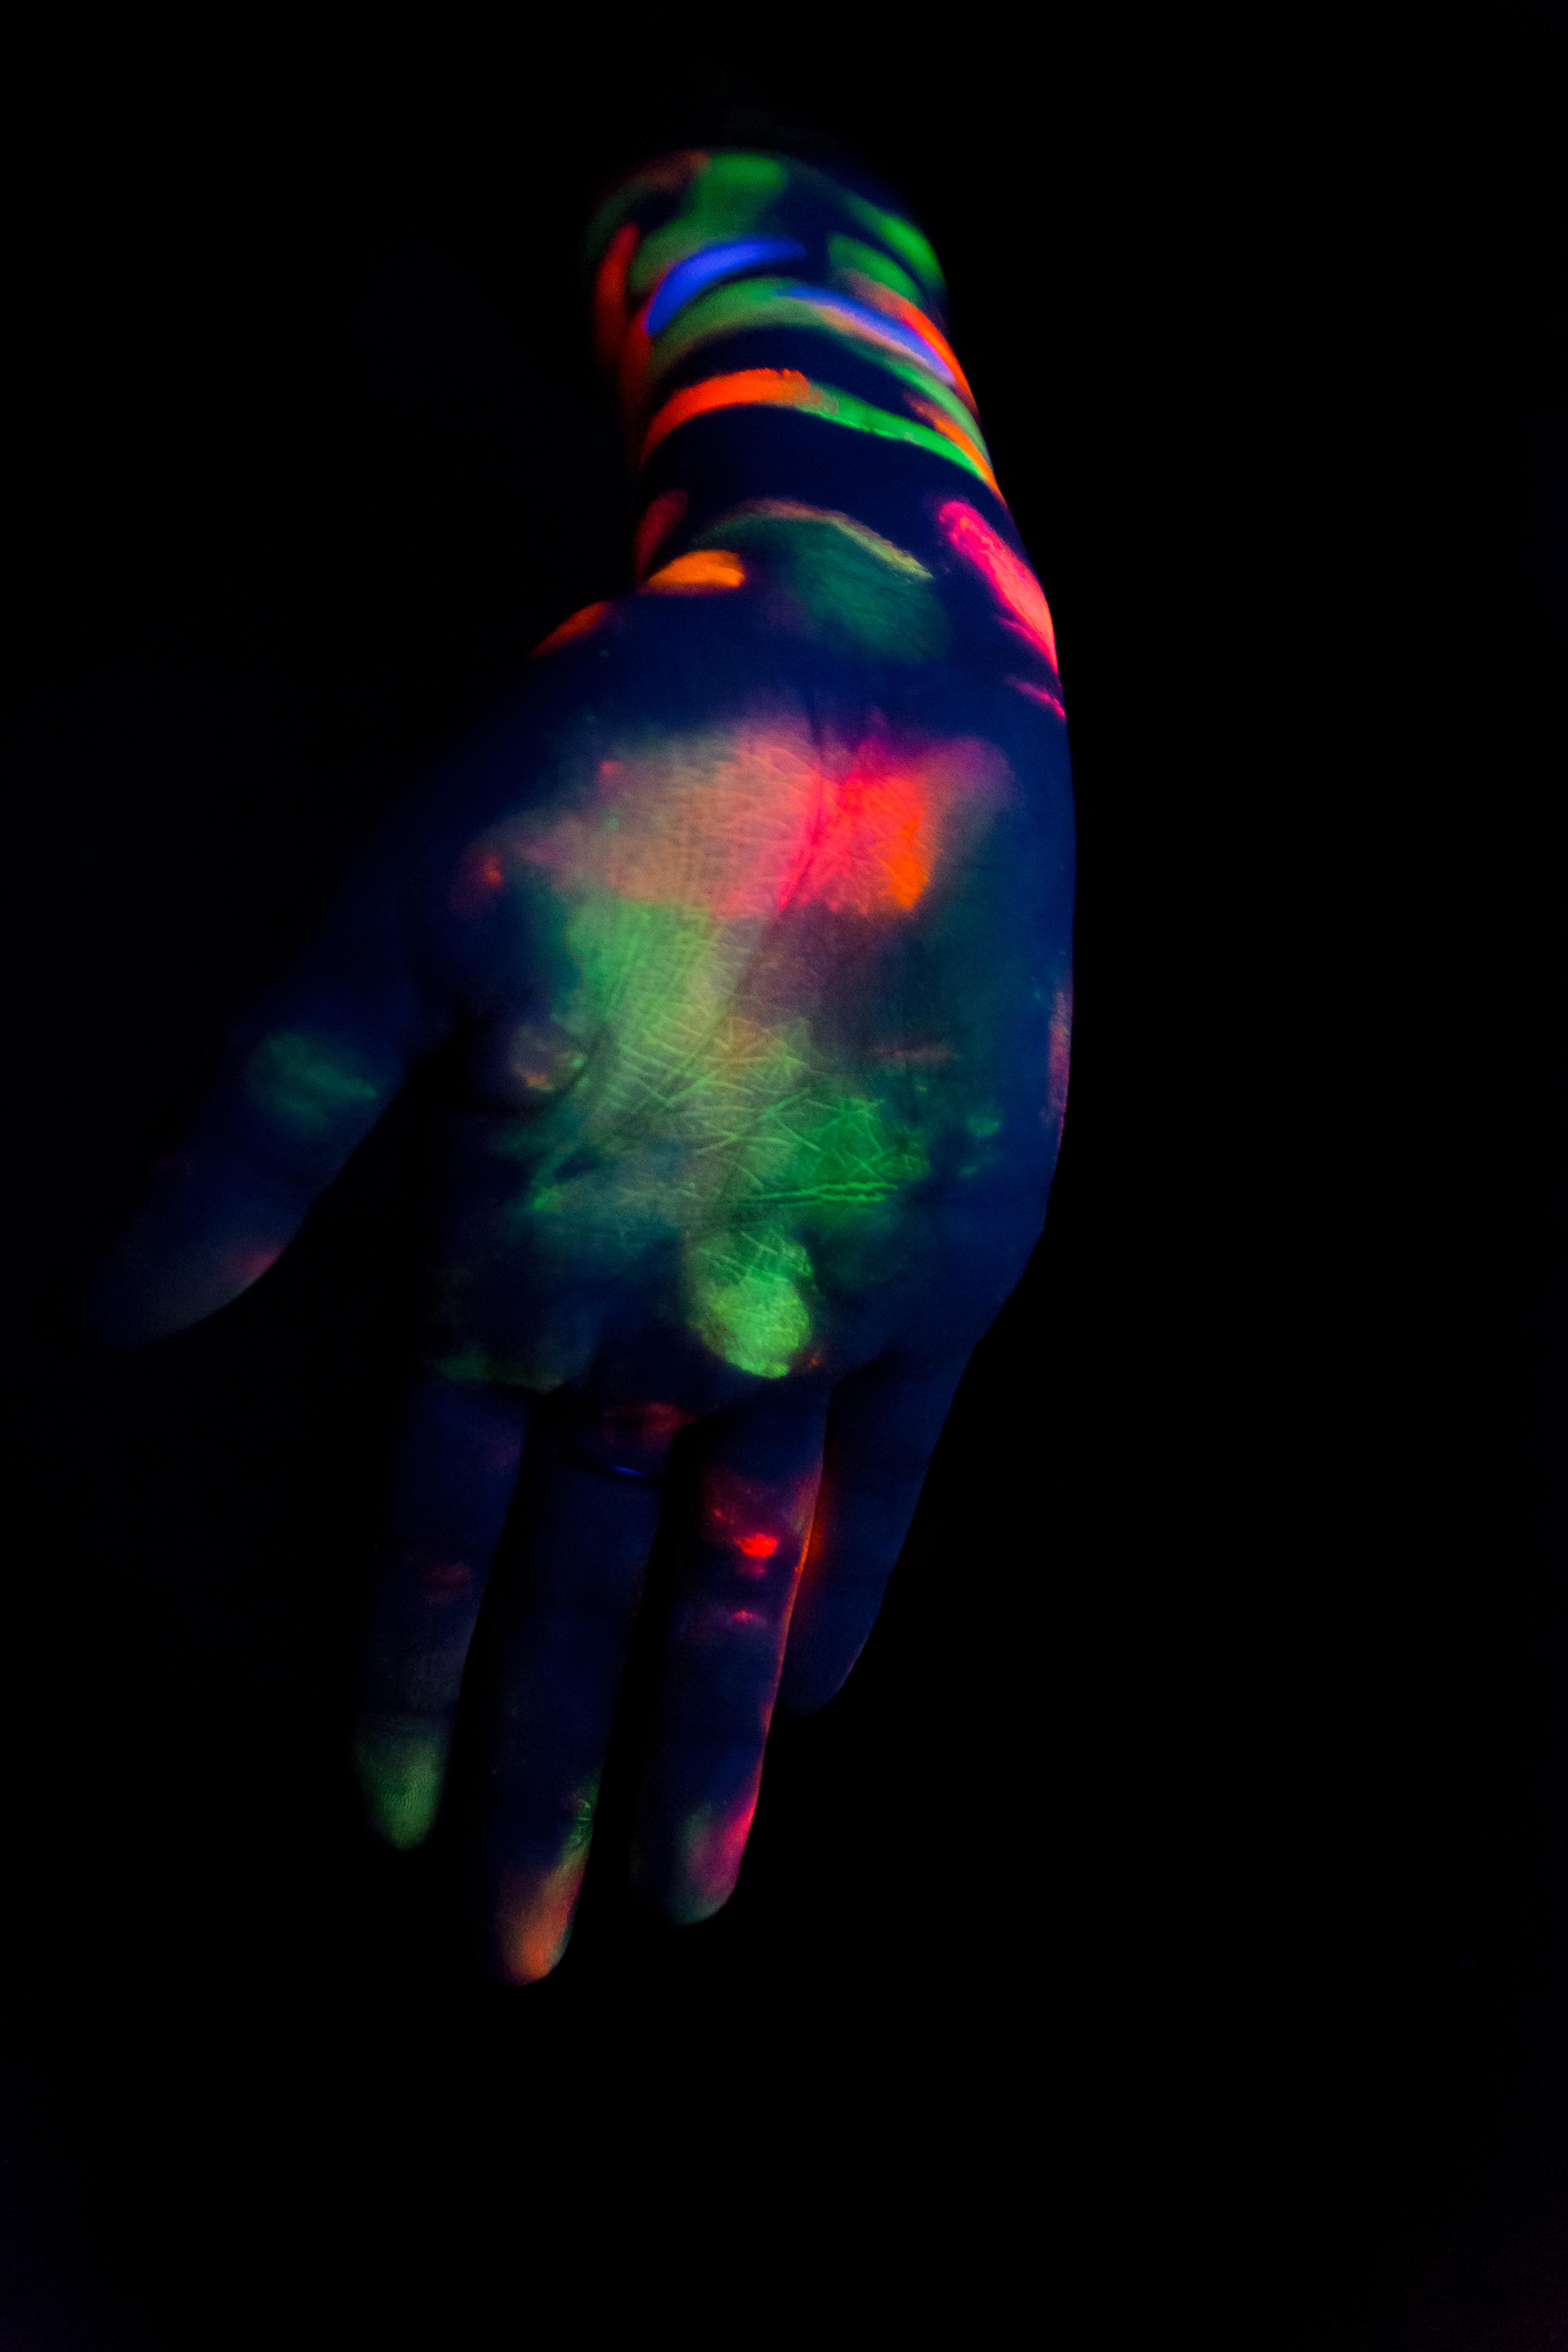 Glow in the dark, Neon Paint Party